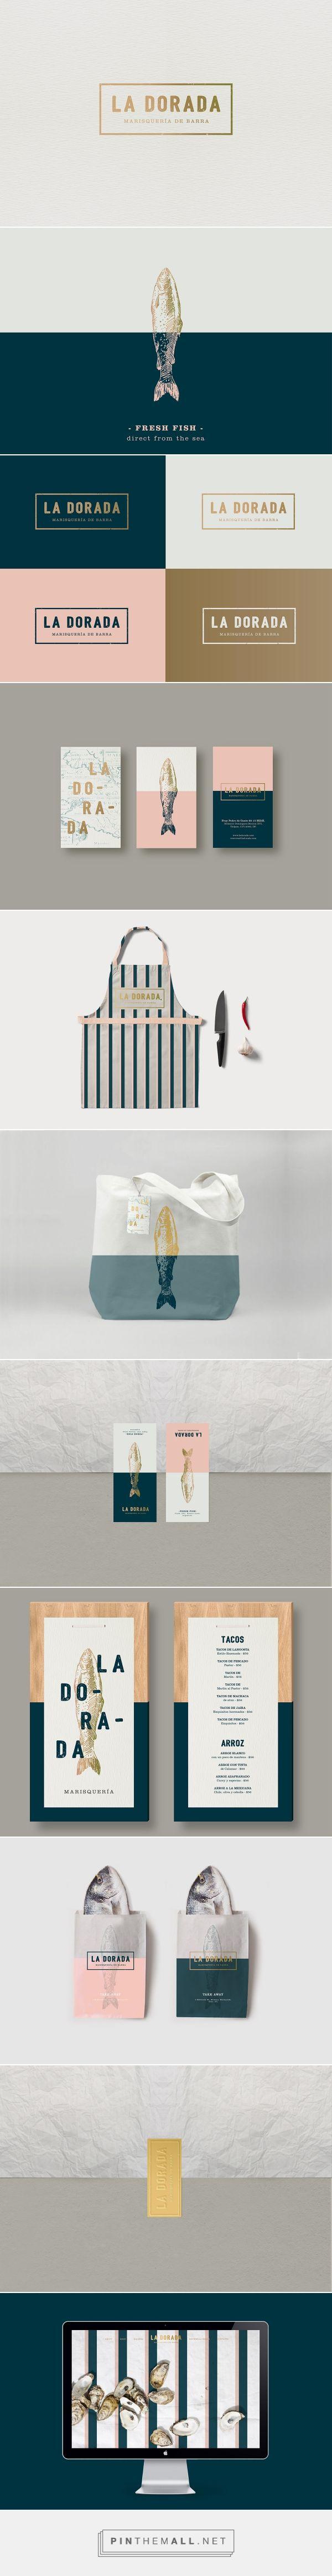 La Dorada Restaurant Branding and Menu Design by Vanya Silva | Fivestar Branding Agency – Design and Branding Agency & Inspiration Gallery